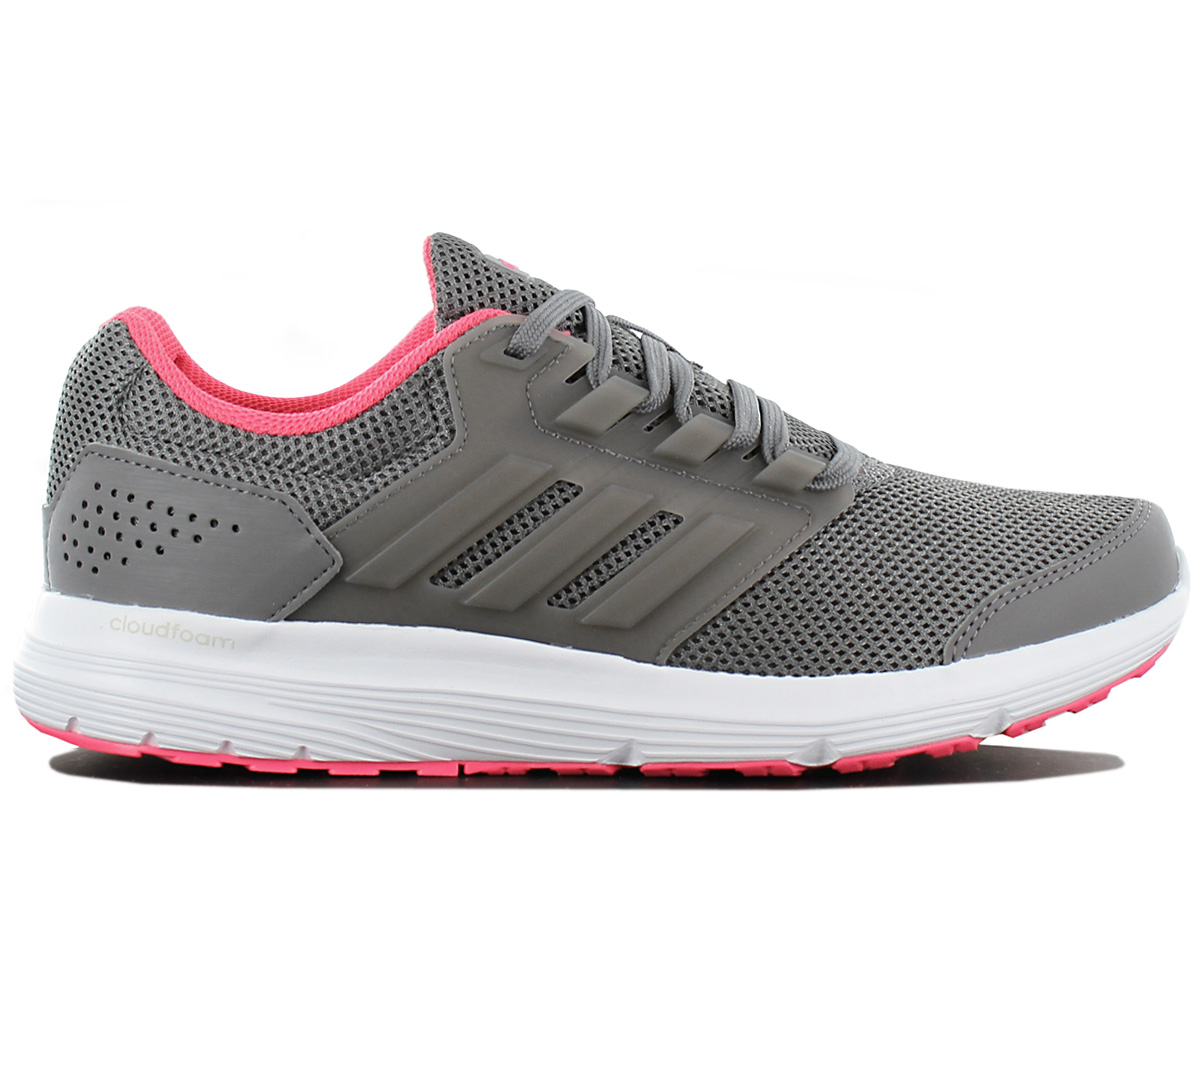 Adidas Galaxy 4 Damen Schuhe Running Grau Rabatt